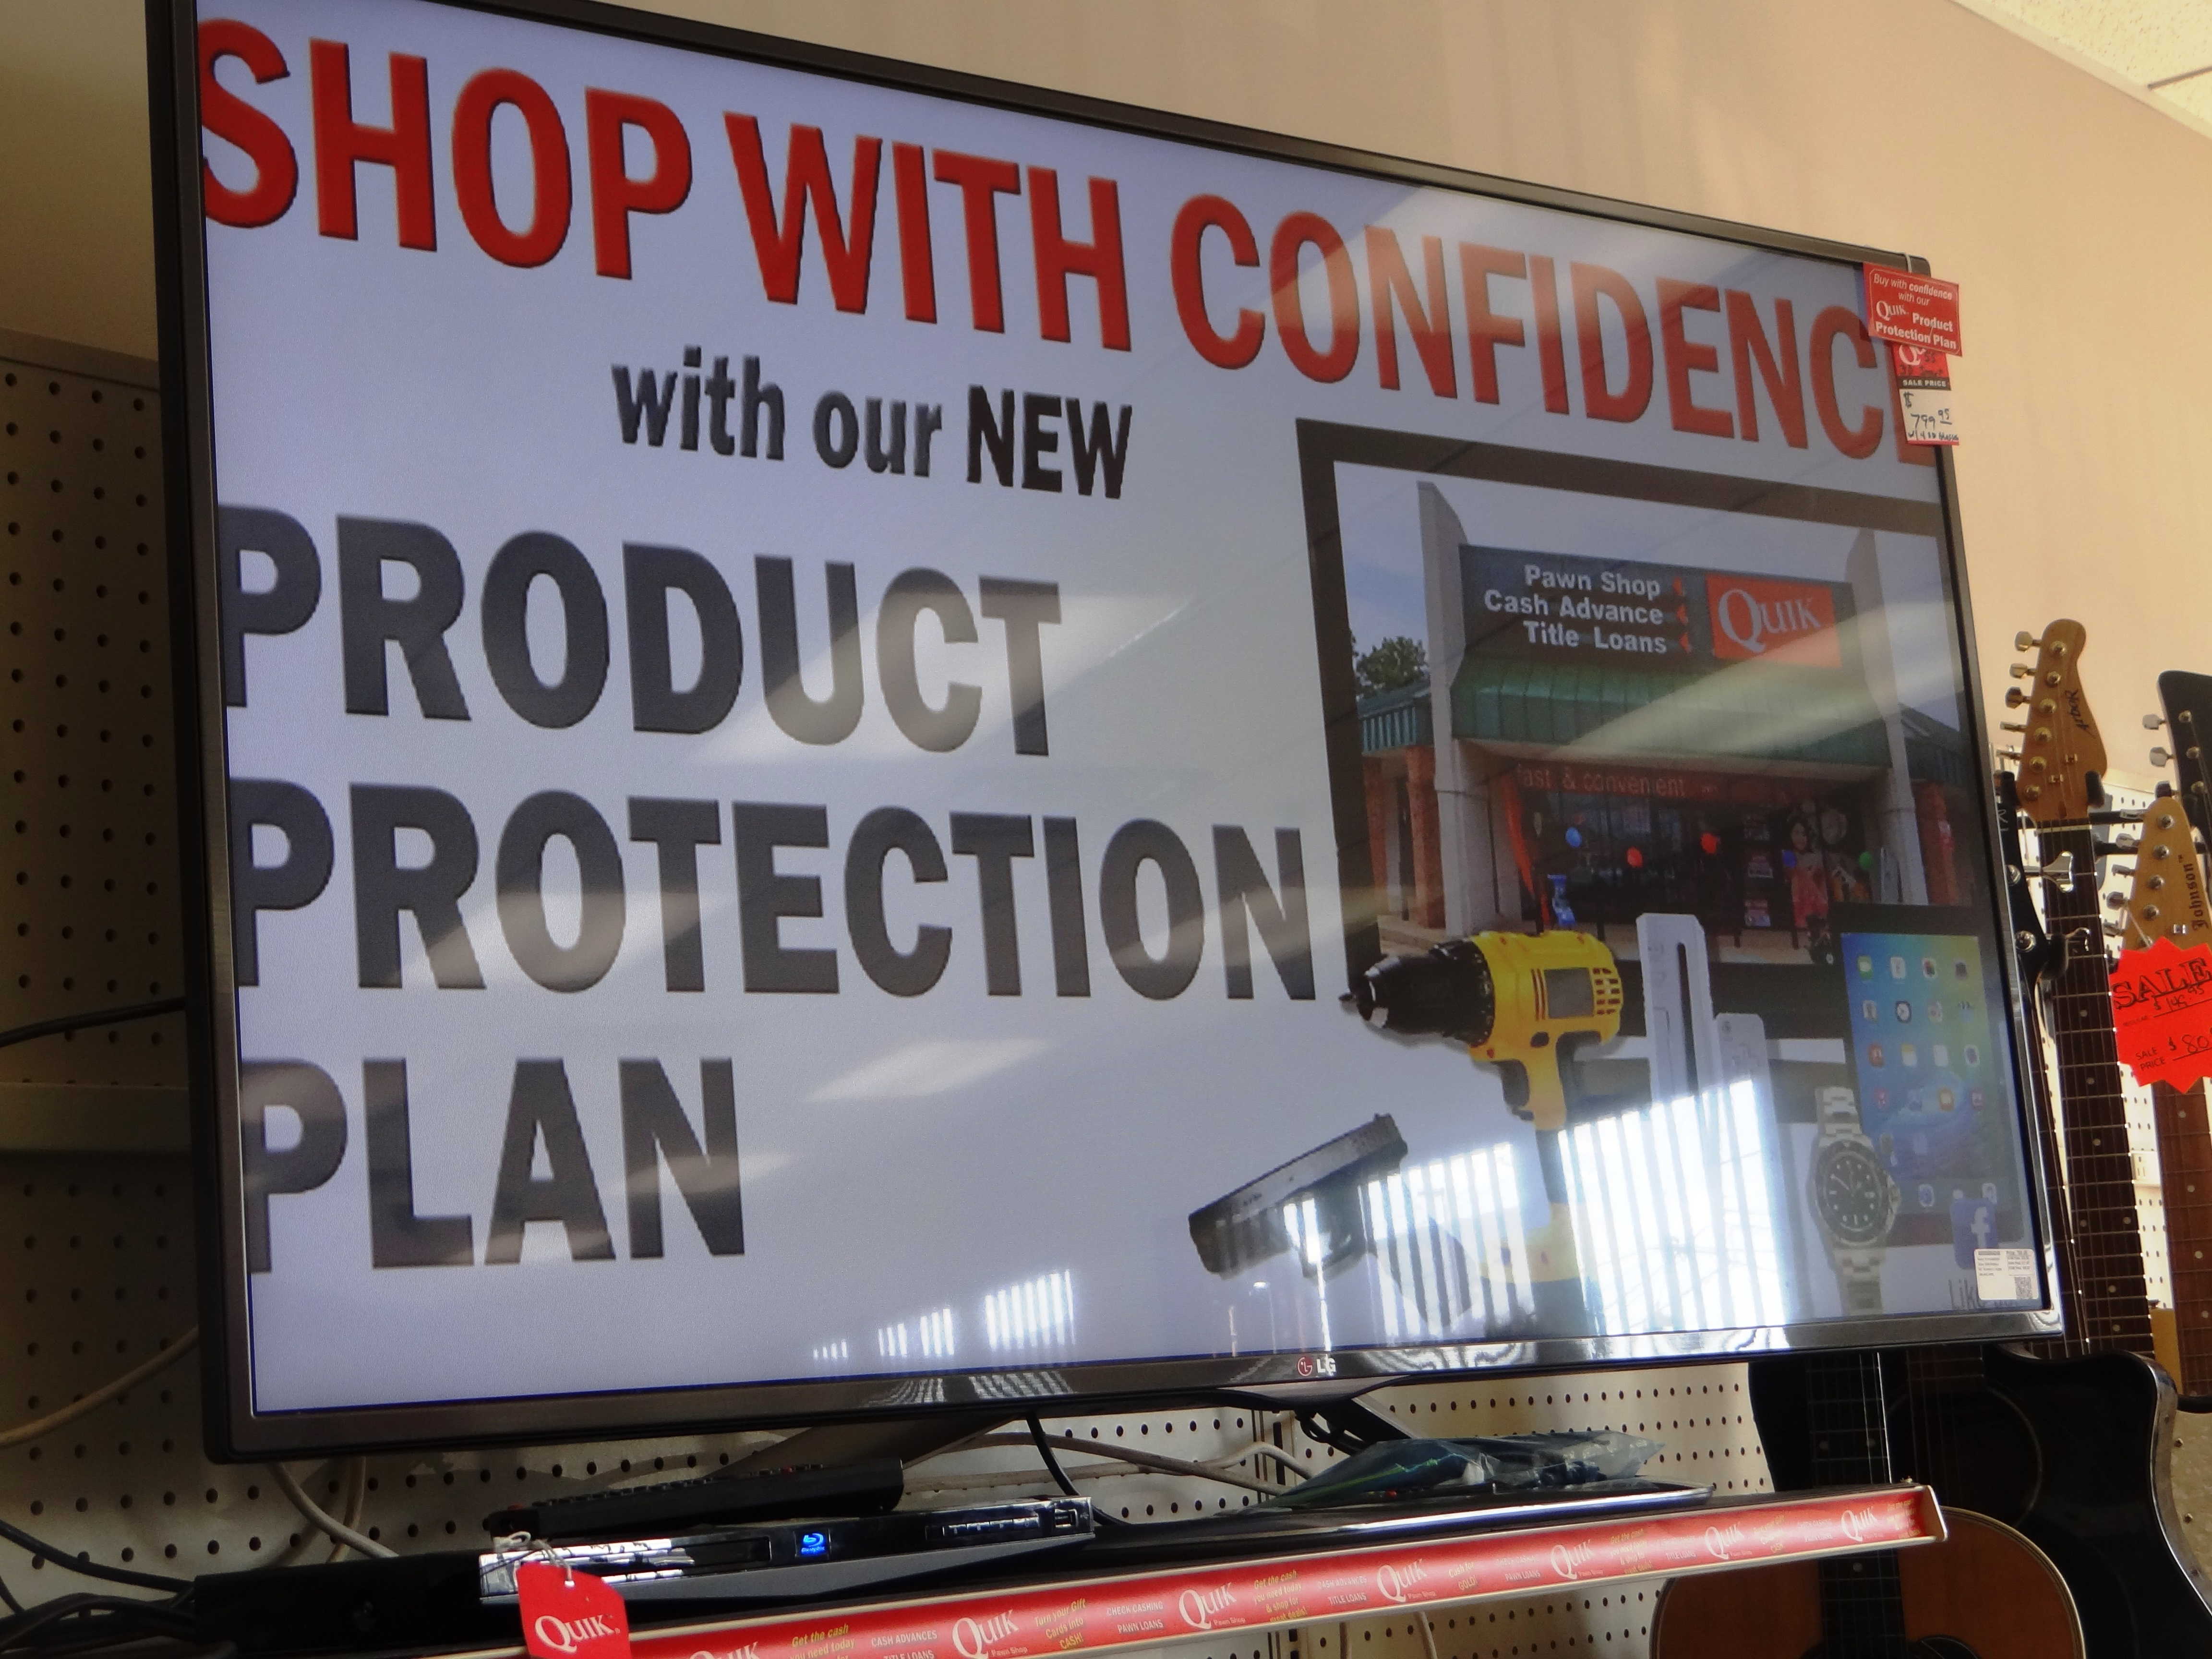 quik-pawn-shop-product-protection-plan